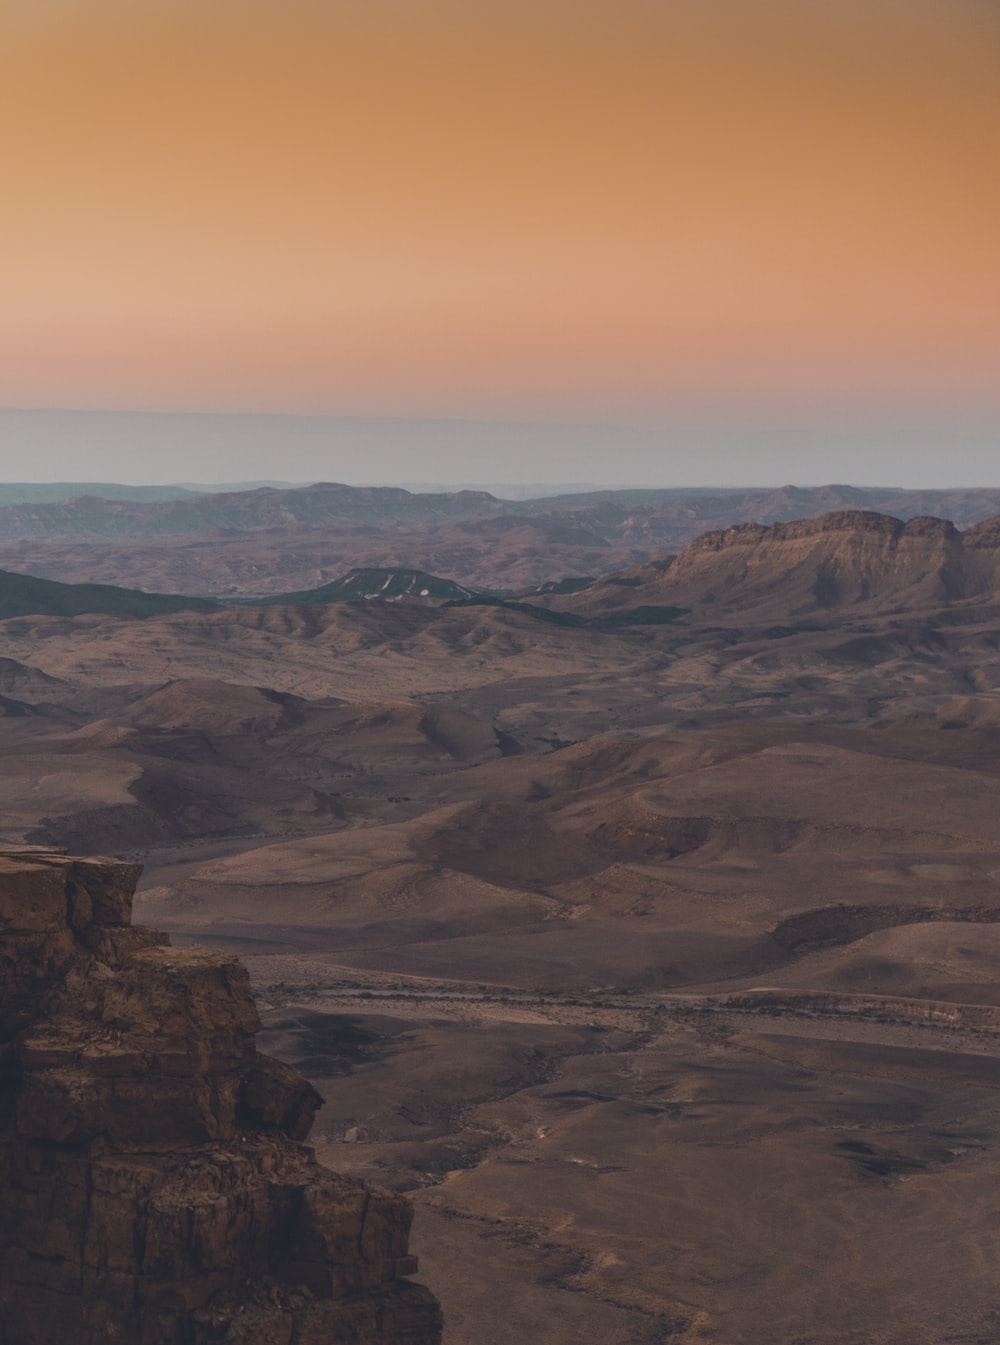 brown rocky mountain under orange sky during daytime